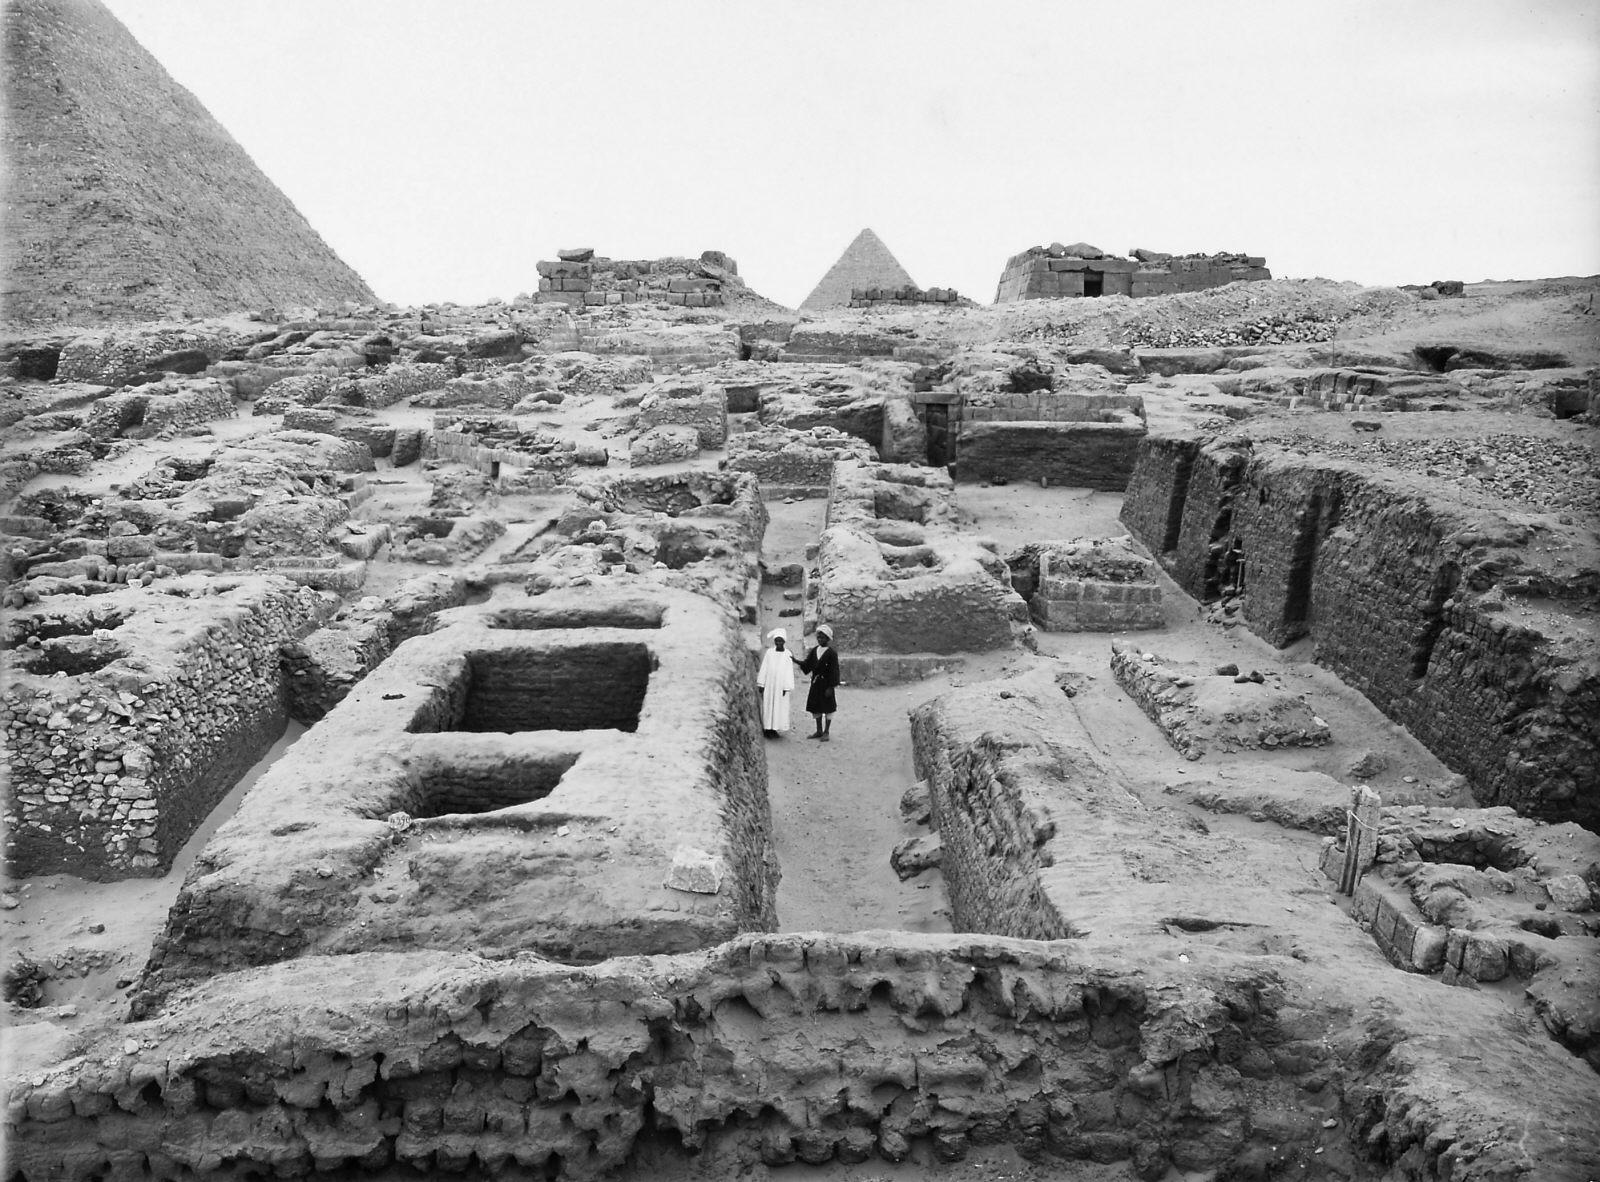 Western Cemetery: Site: Giza; View: S 4290, Iiu, G 1351, S 4233/4283, Hetepkhnemet, S 4299, S 4285/4287